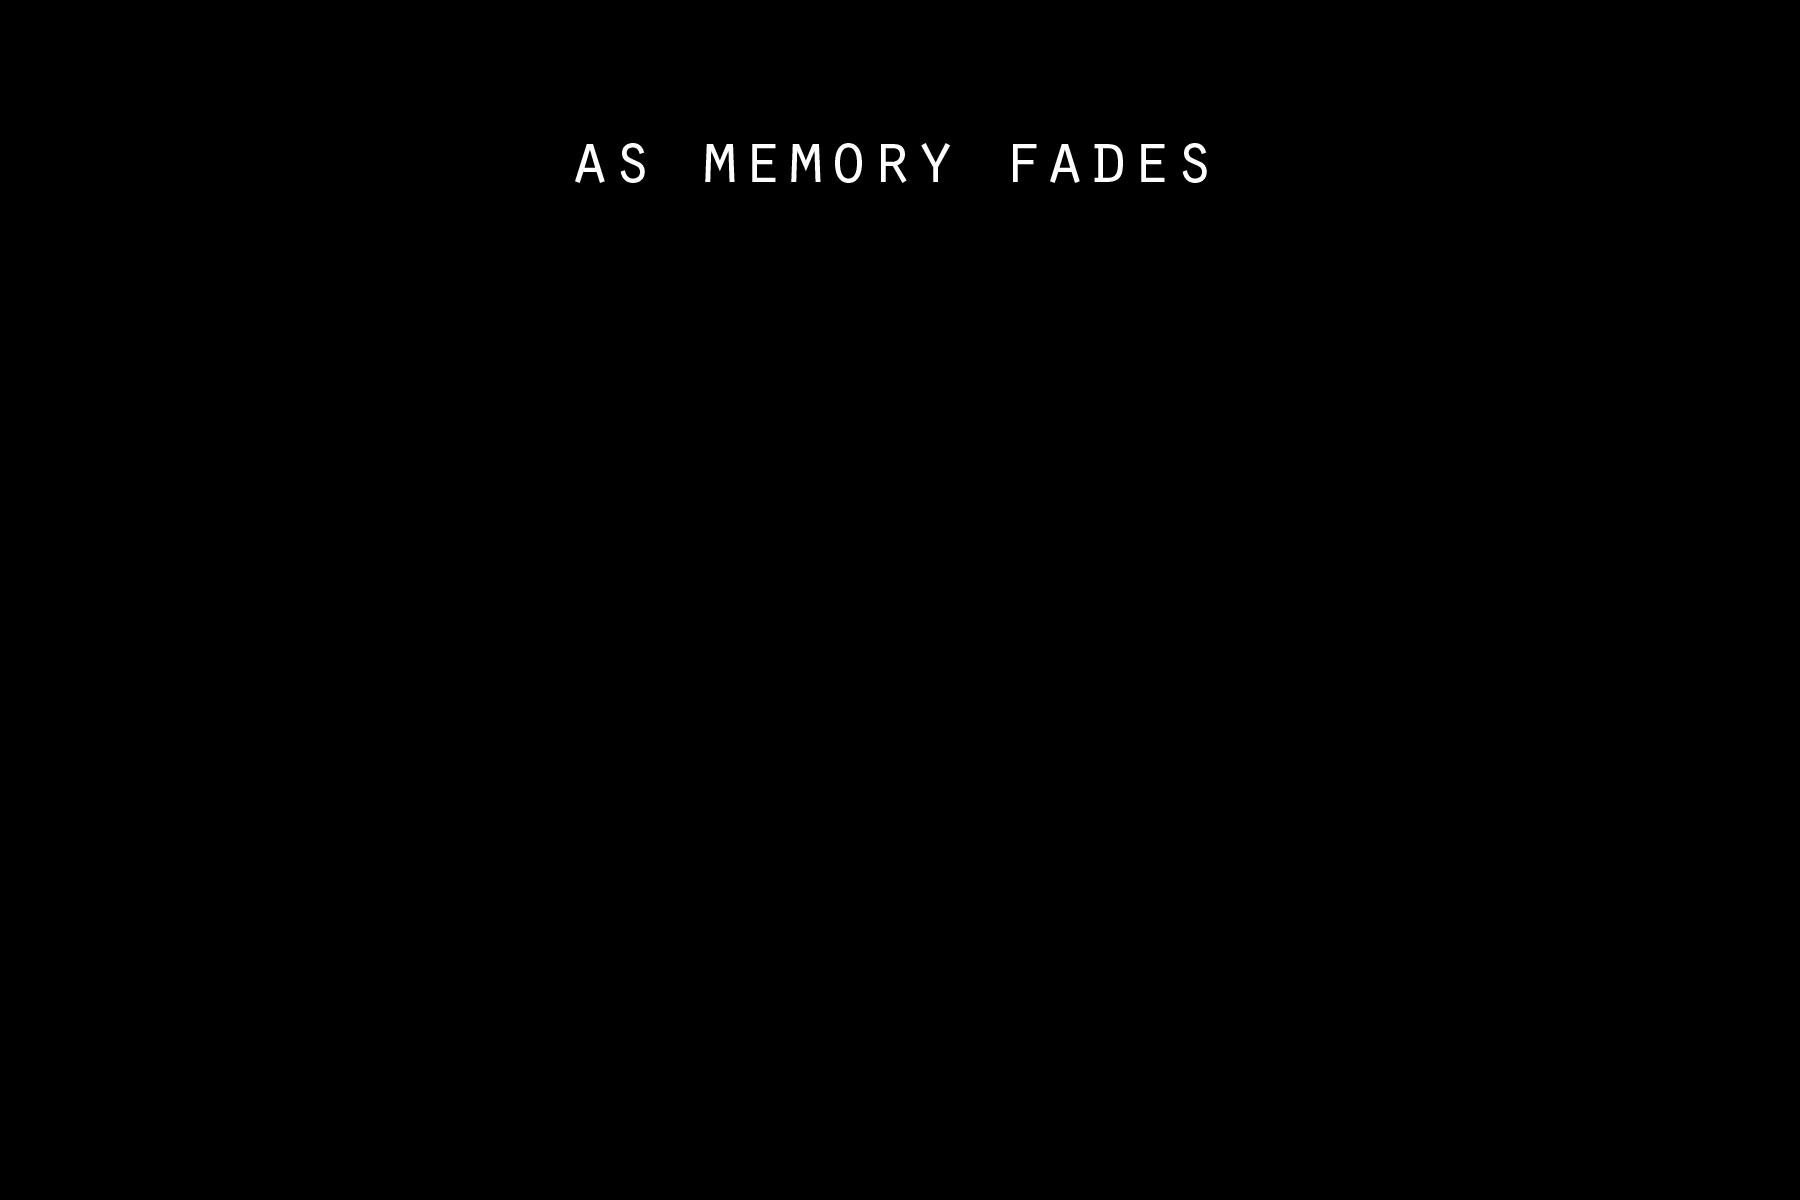 as-memory-fades